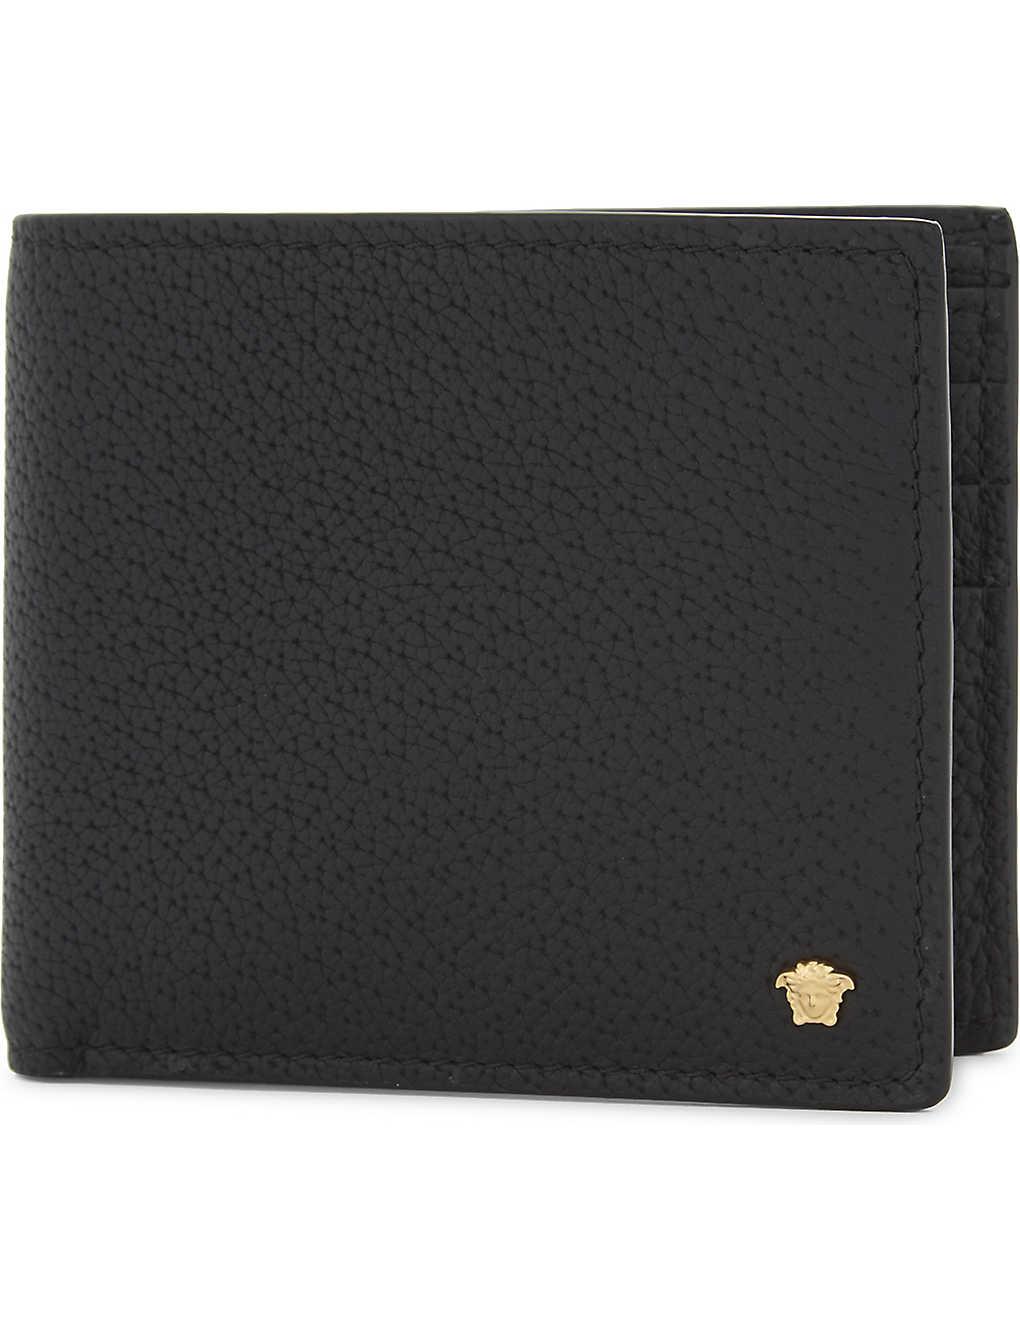 fa220c227fb VERSACE - Medusa leather billfold wallet | Selfridges.com